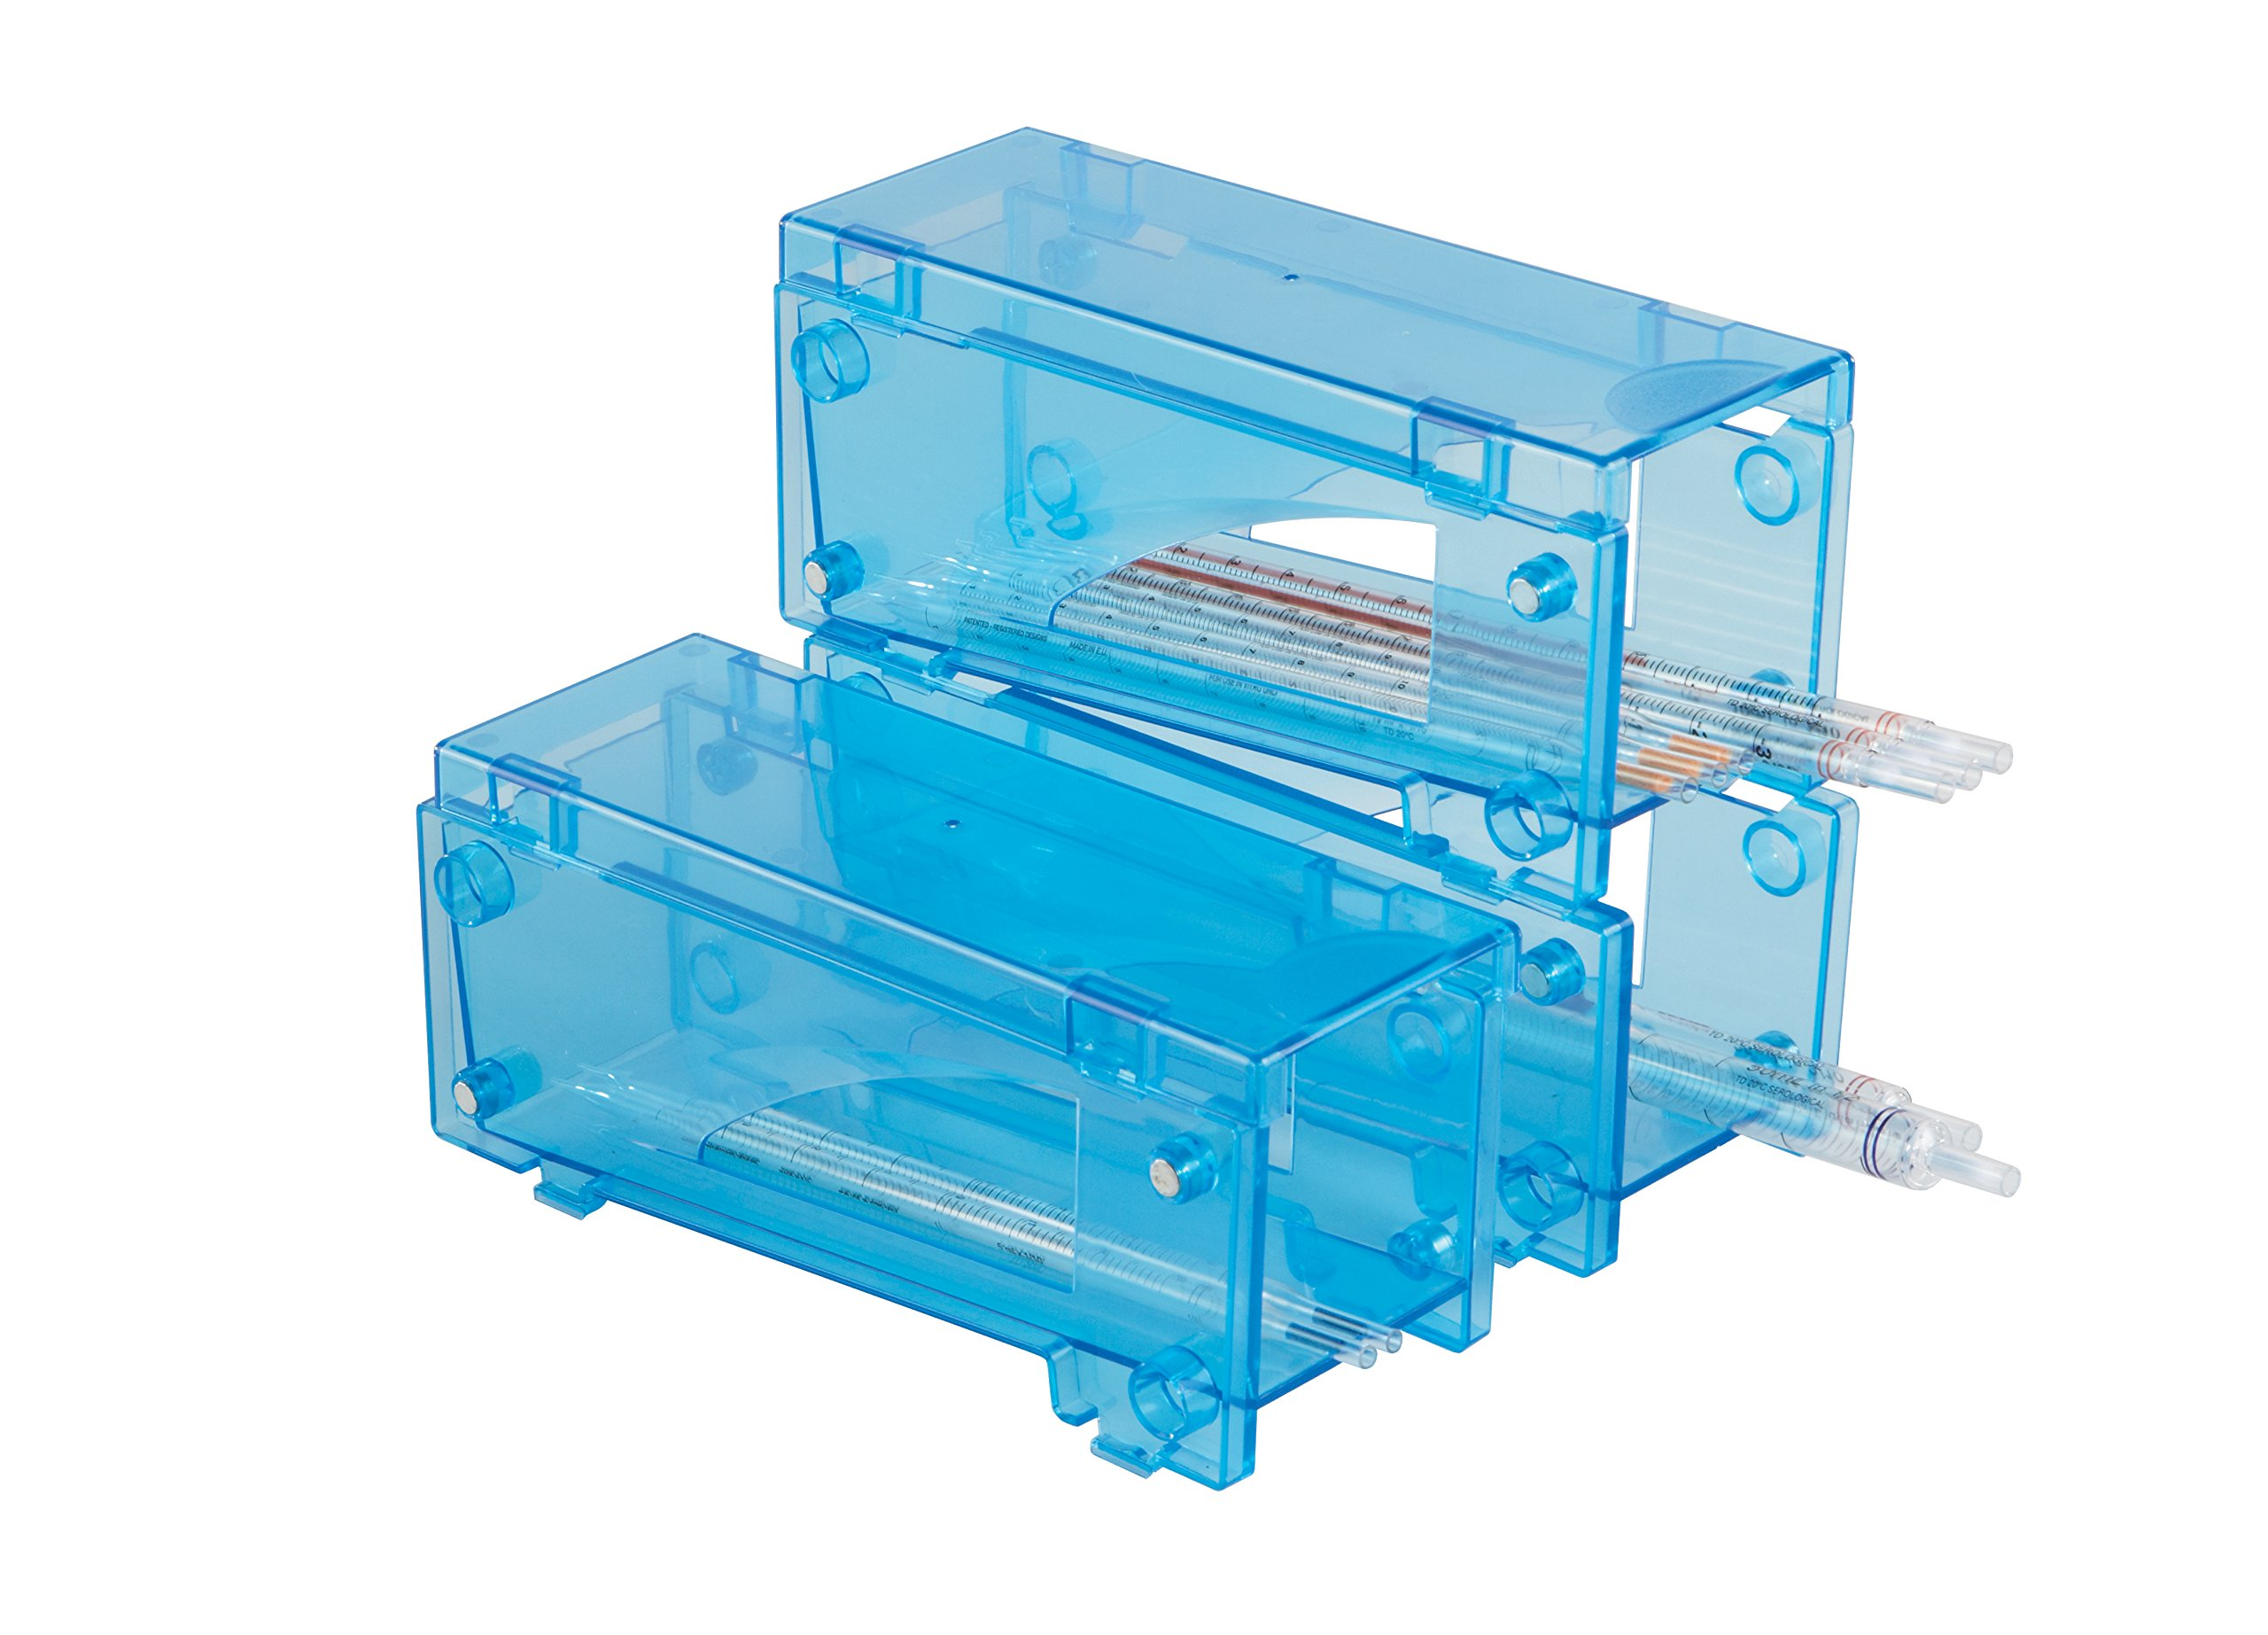 Heathrow Scientific HD20615M Blue Cargo Manual Pipette Rack, 95mm Width x 301mm Height x 127.5mm Depth (Pack of 3)